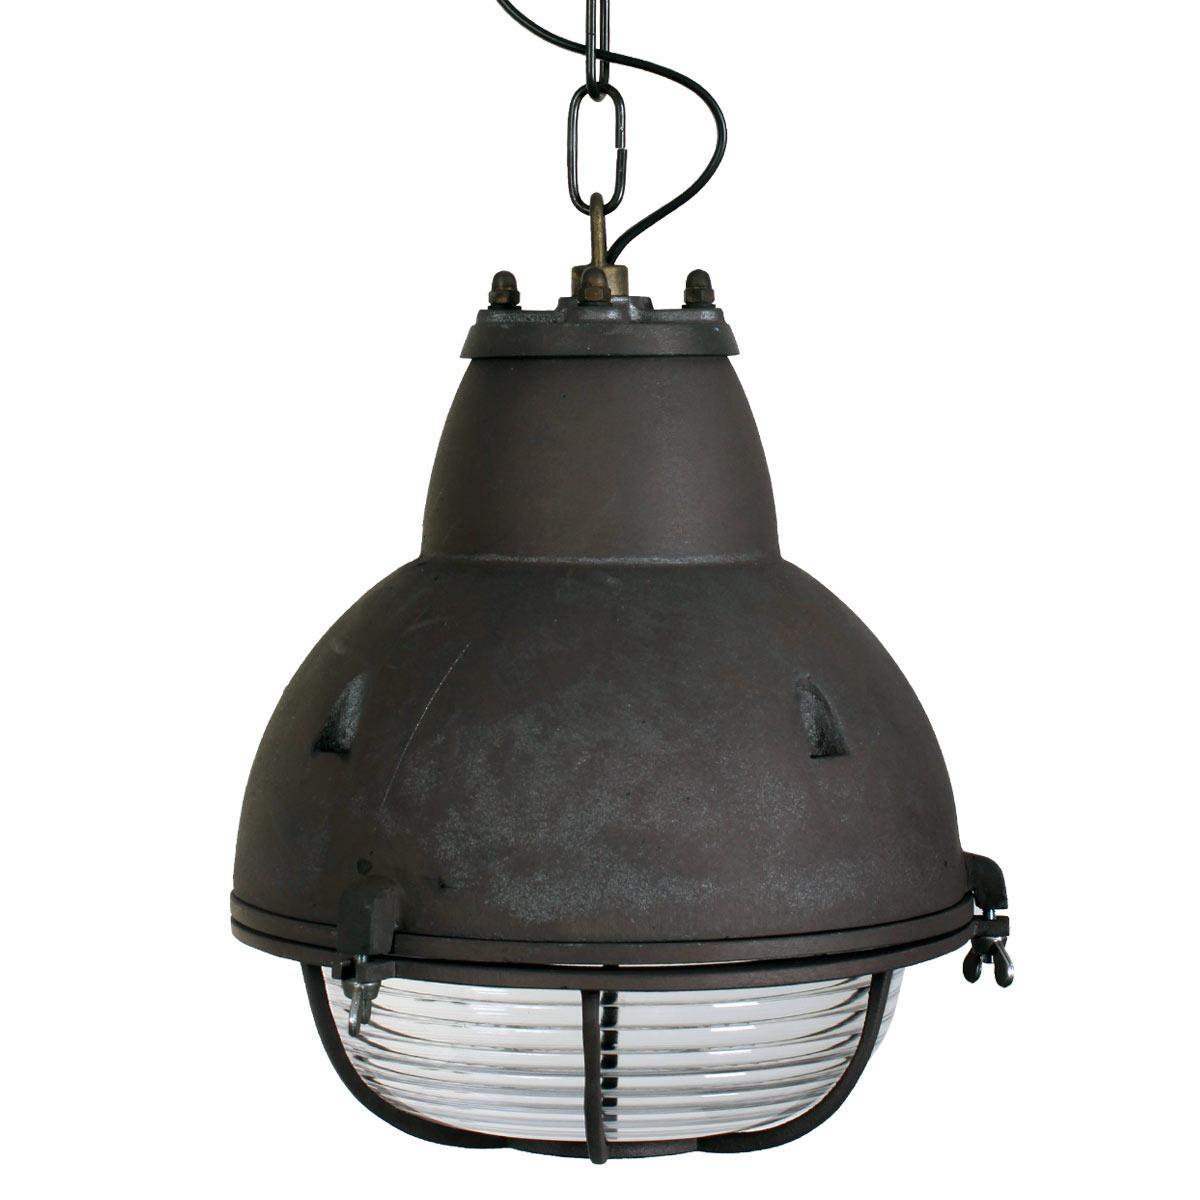 6507-hanglamp-navigator-gietijzer-01-1200x1200